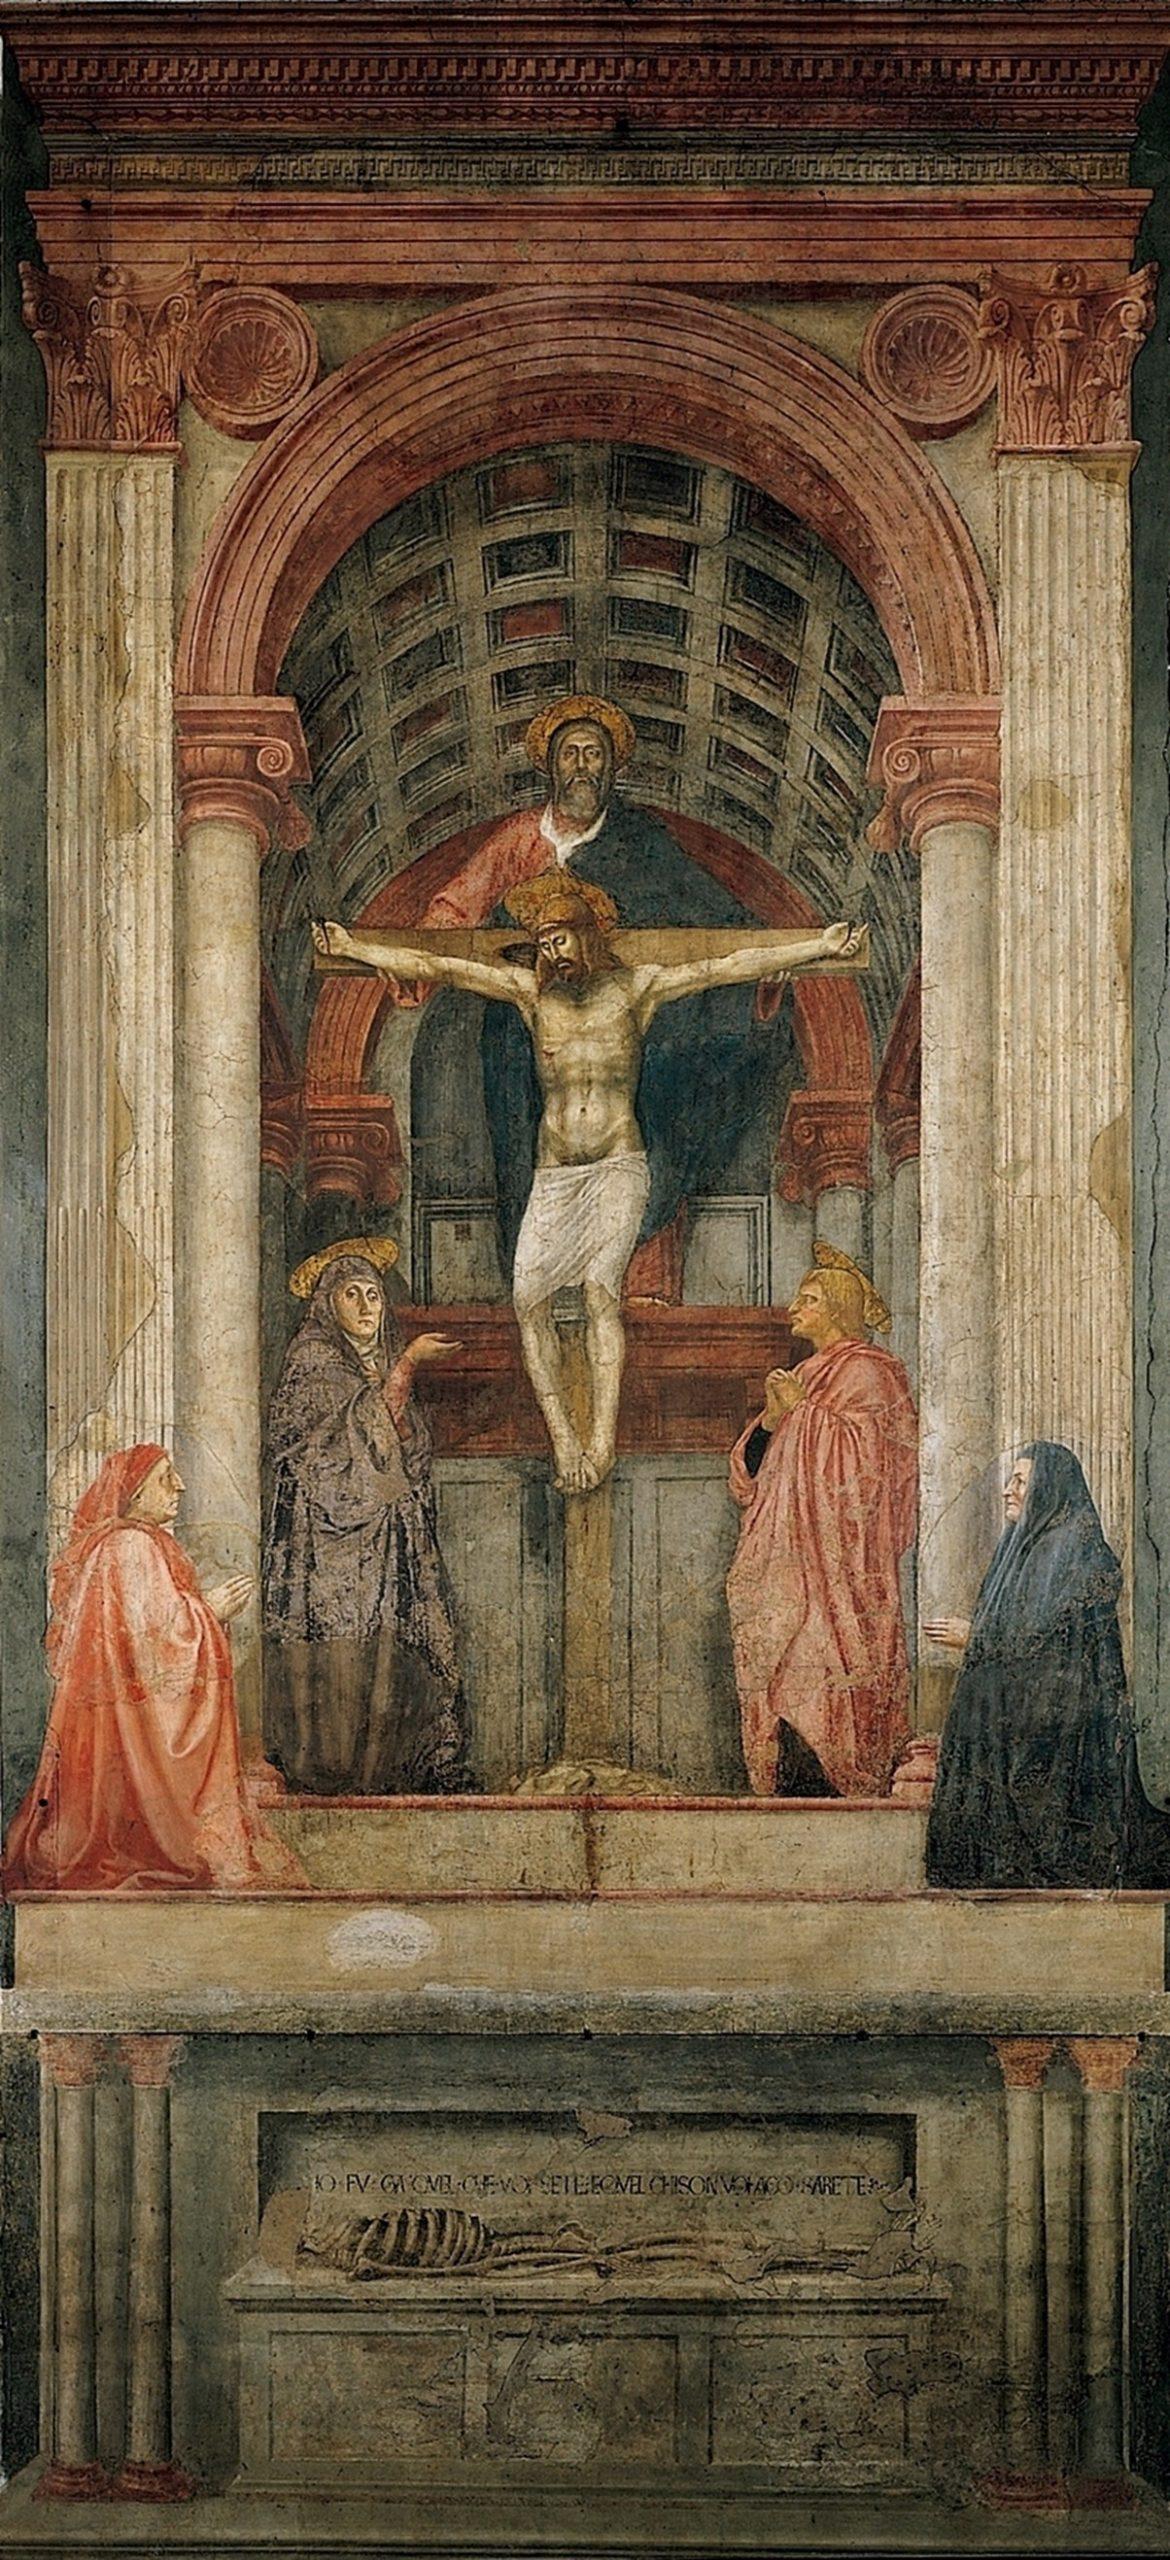 Masaccio, The Holy Trinity, c. 1426-1428, fresco, Santa Maria Novella, Florence.